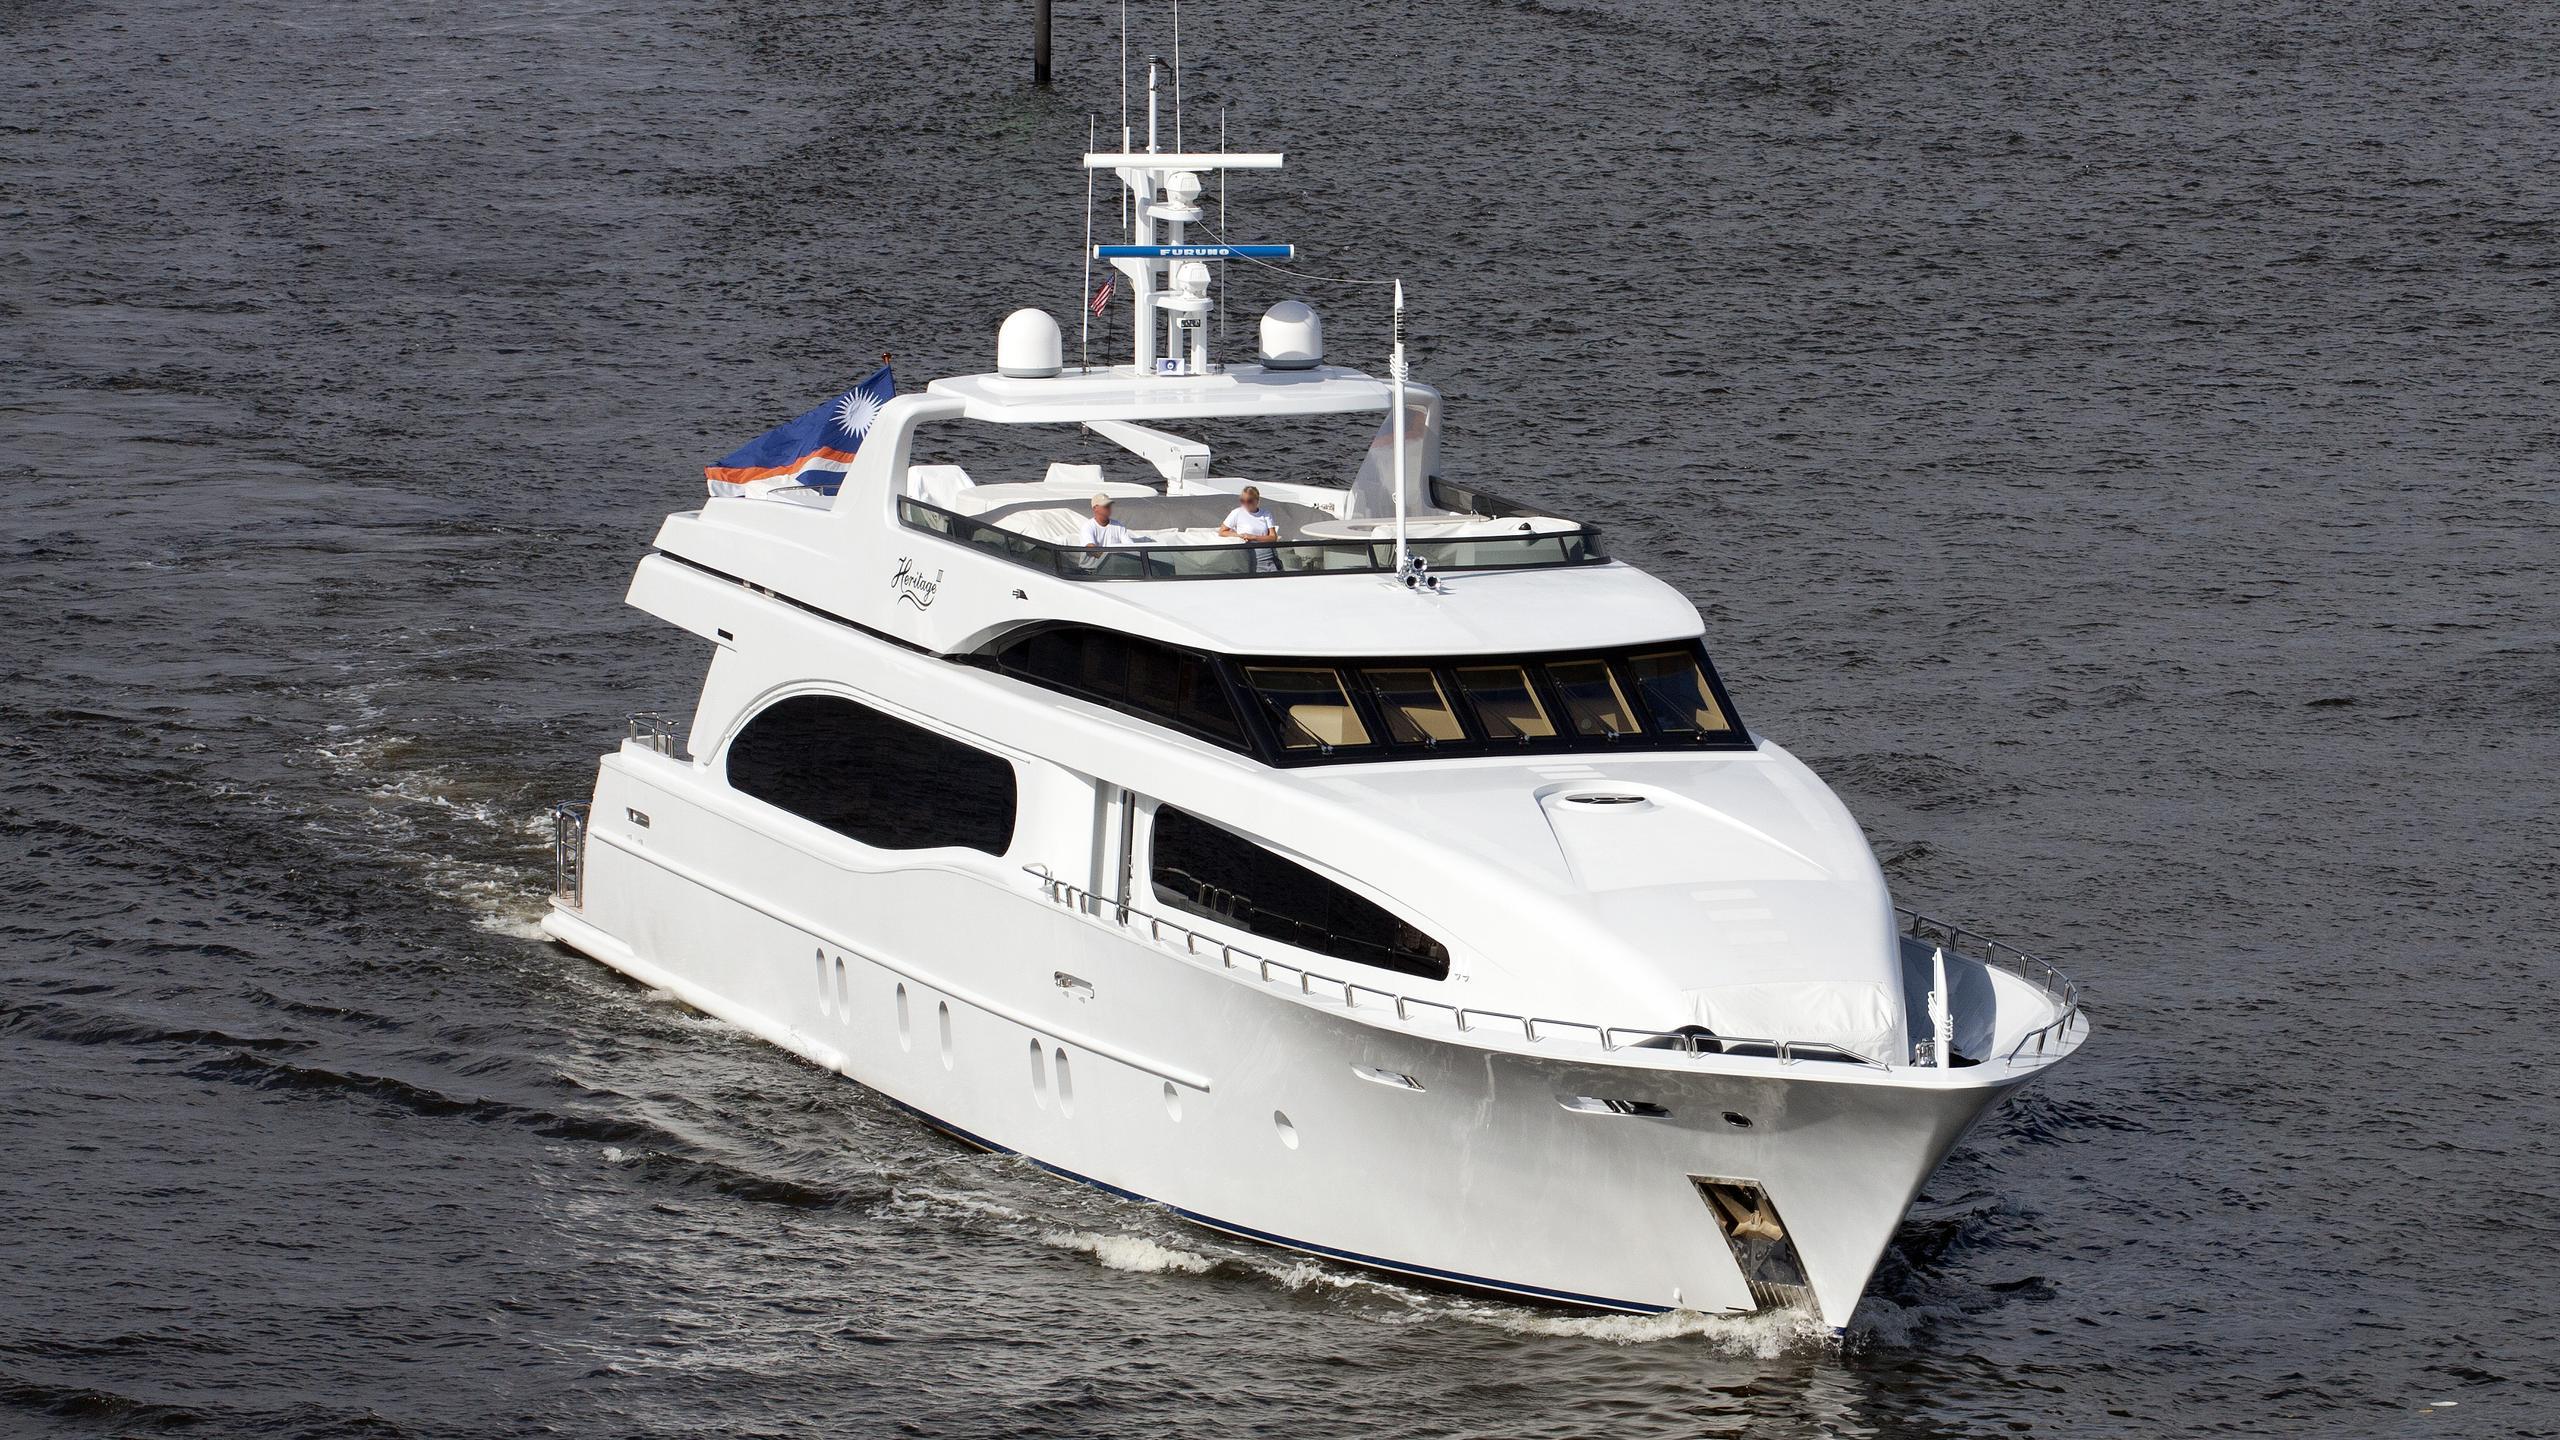 seament aquasition hi-banx motoryacht broward marine 2007 38m half profile